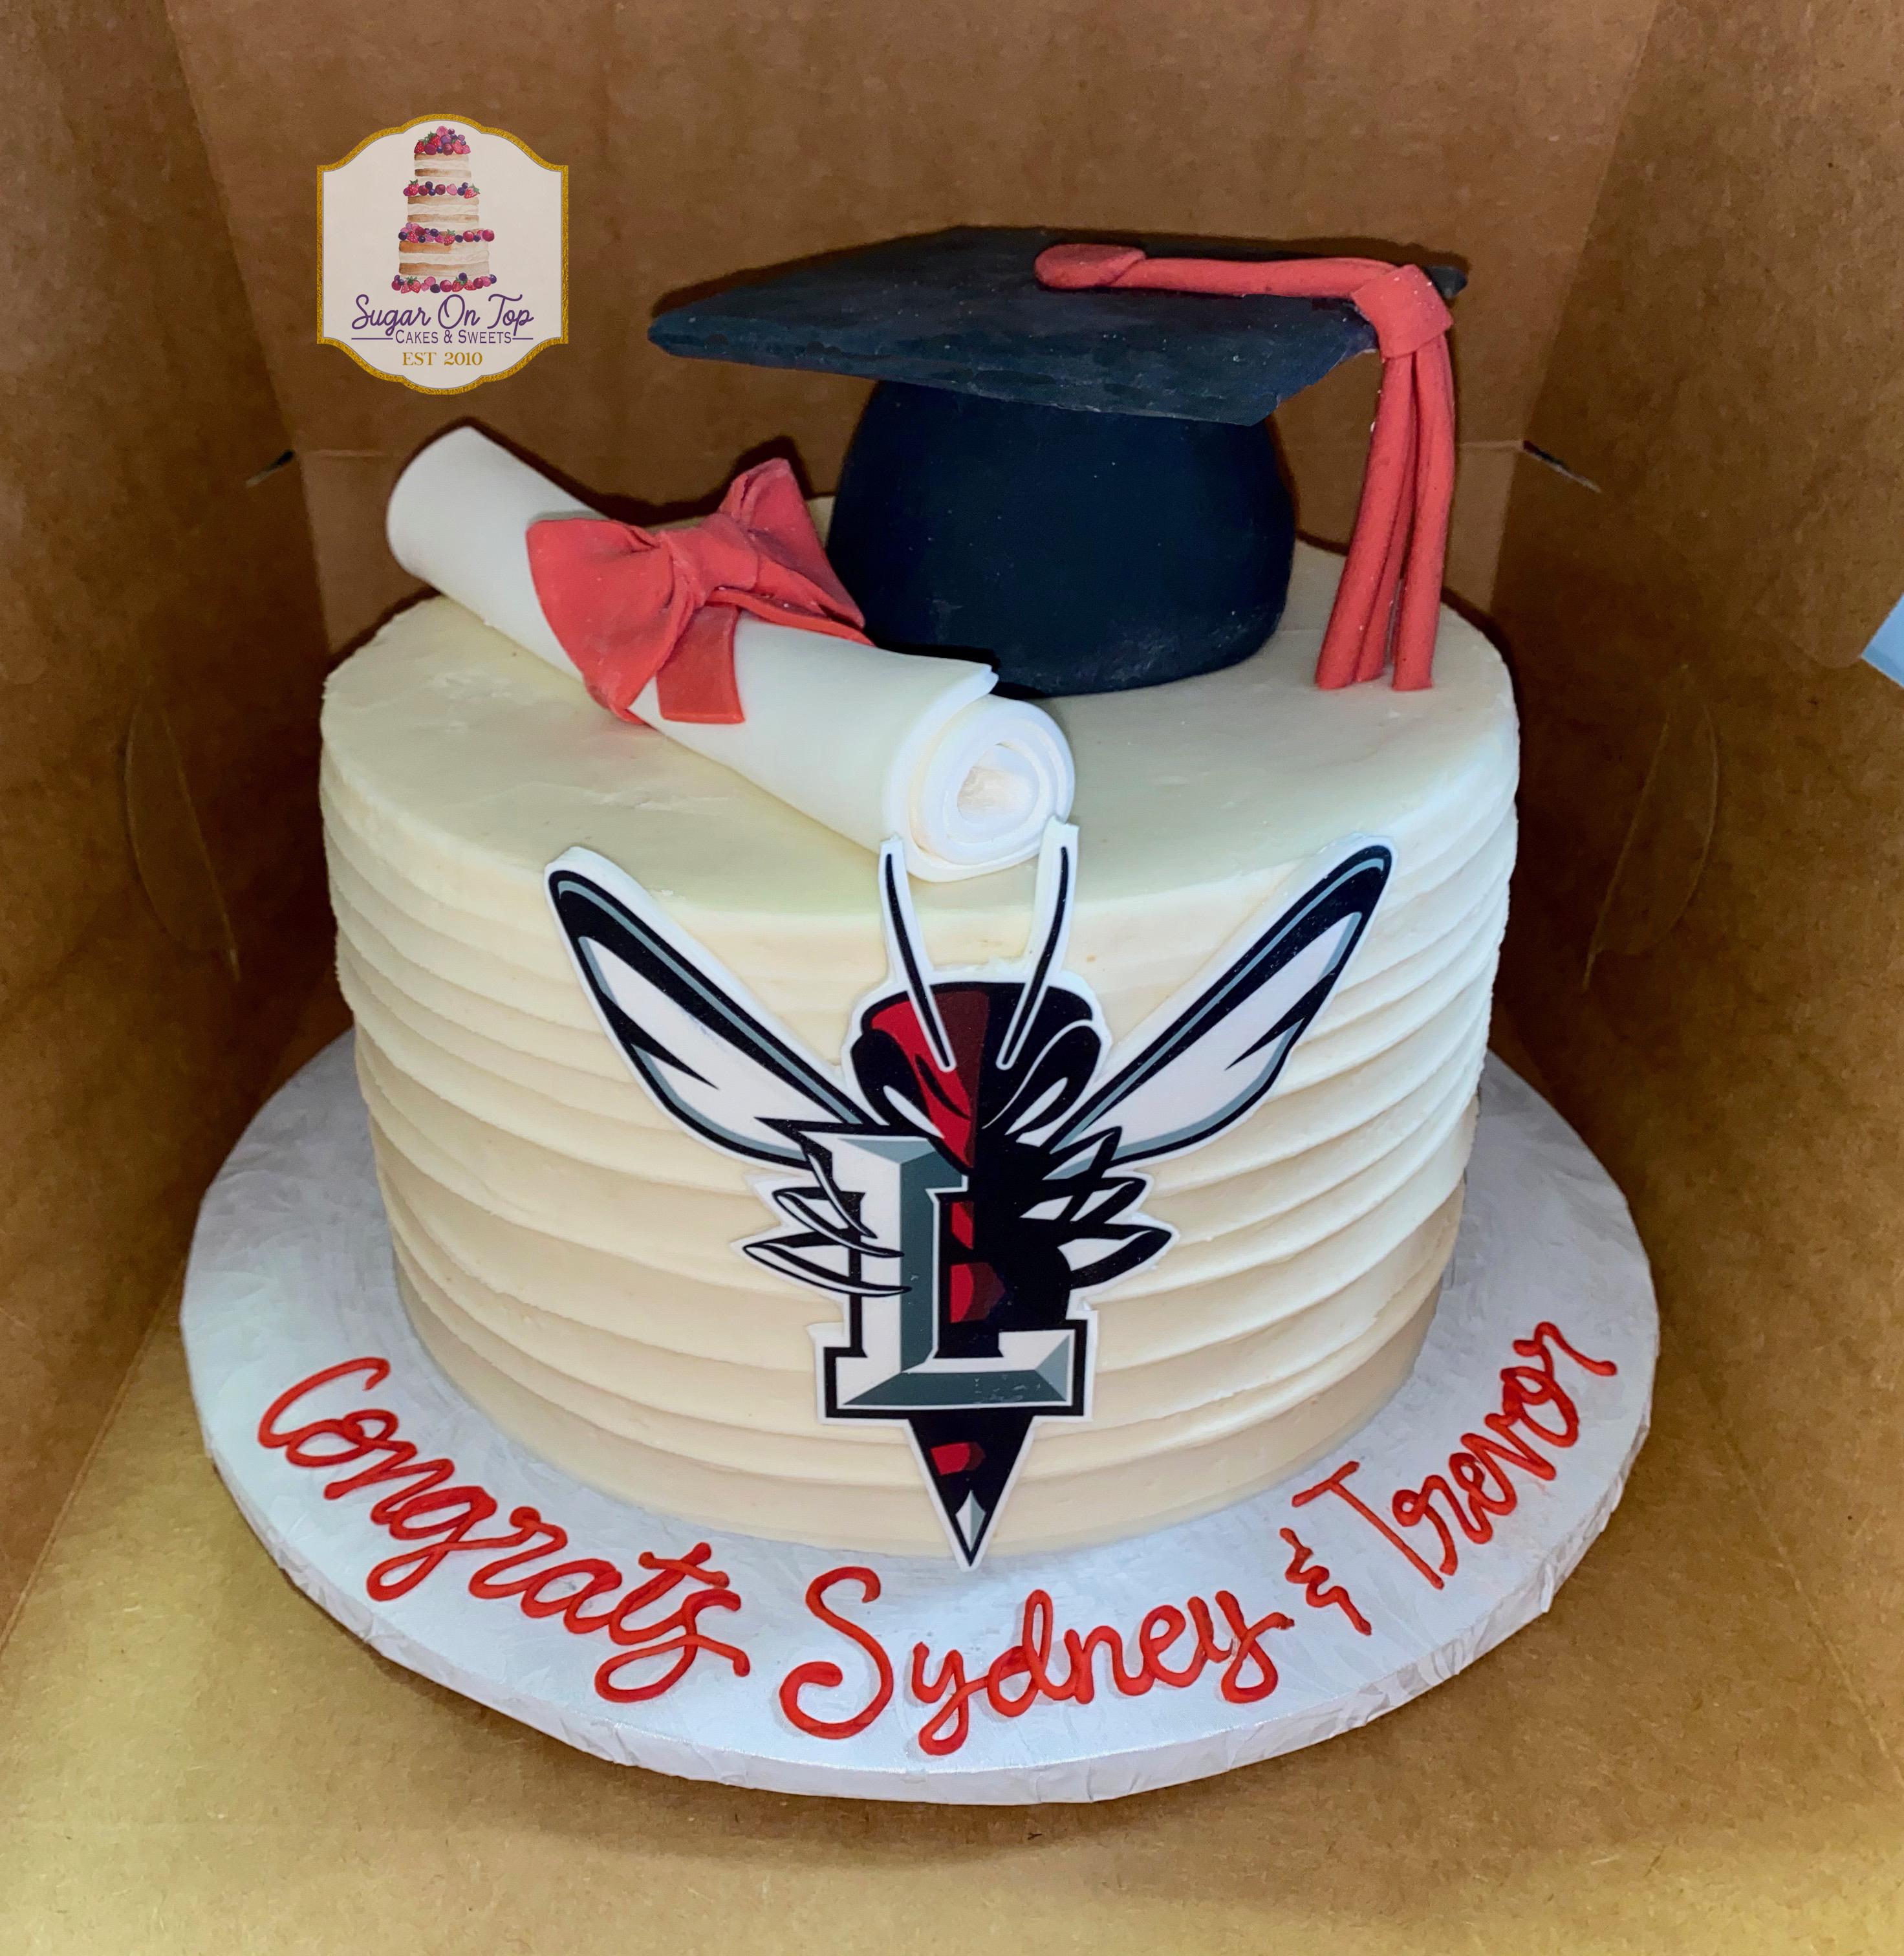 lynchburg univ cake